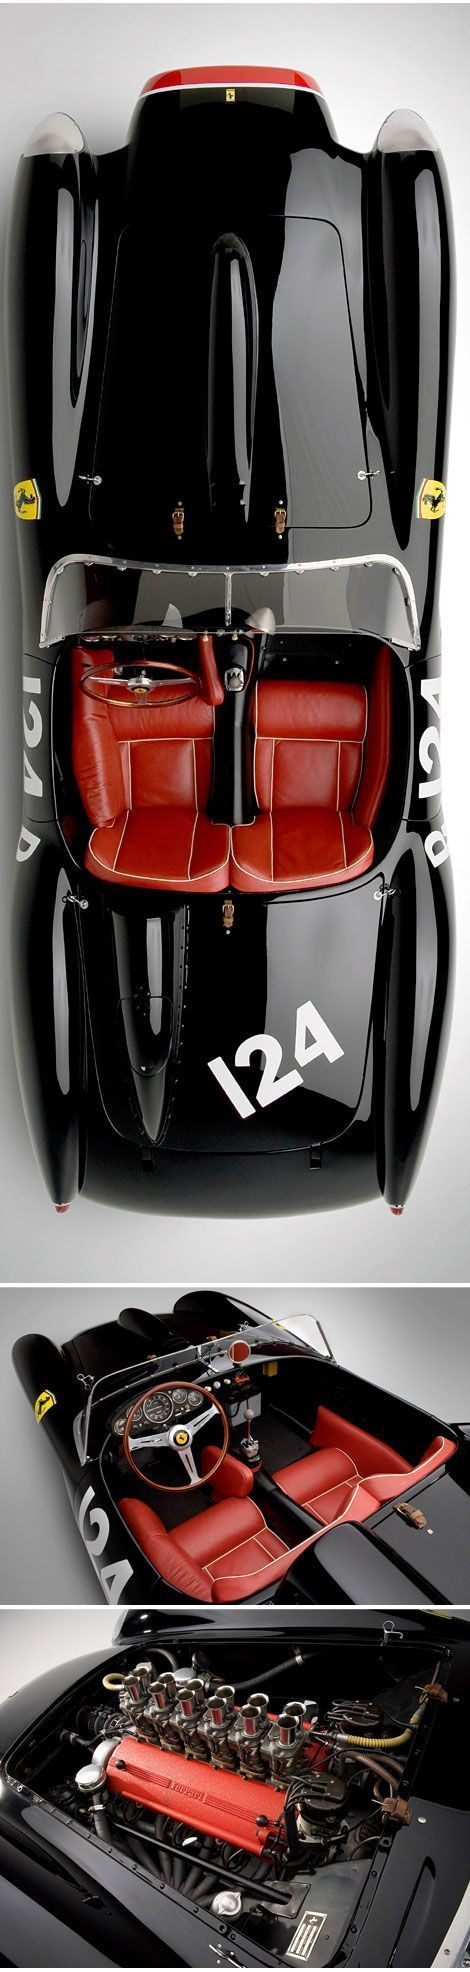 1957 Ferrari 250 Testa Rossa   Autoblog